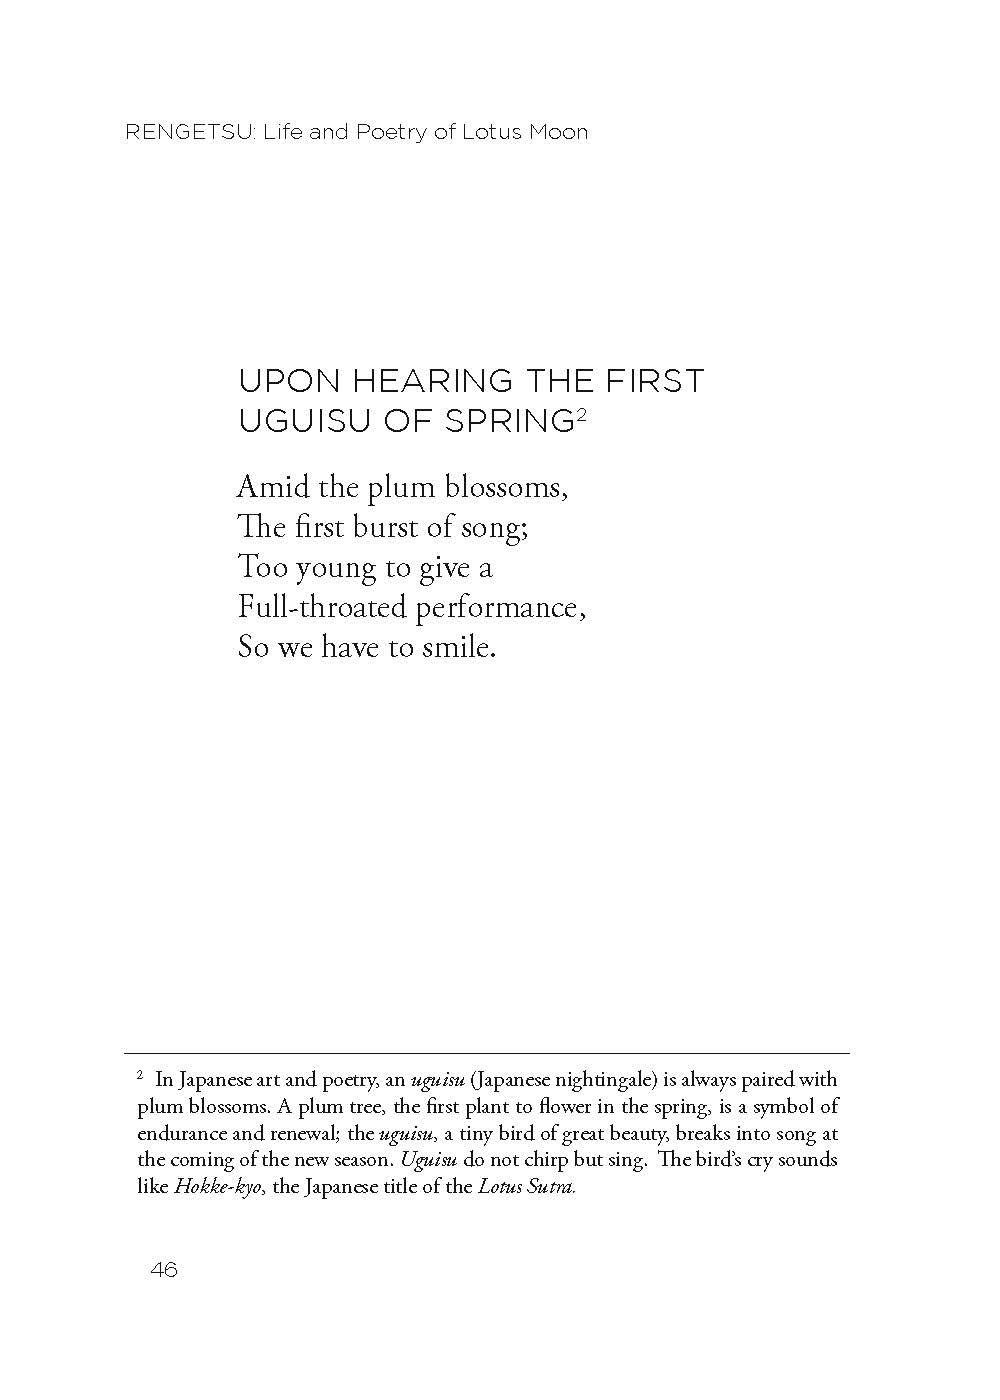 Rengetsus Poetry In Honor Of Spring Translated By John Stevens In